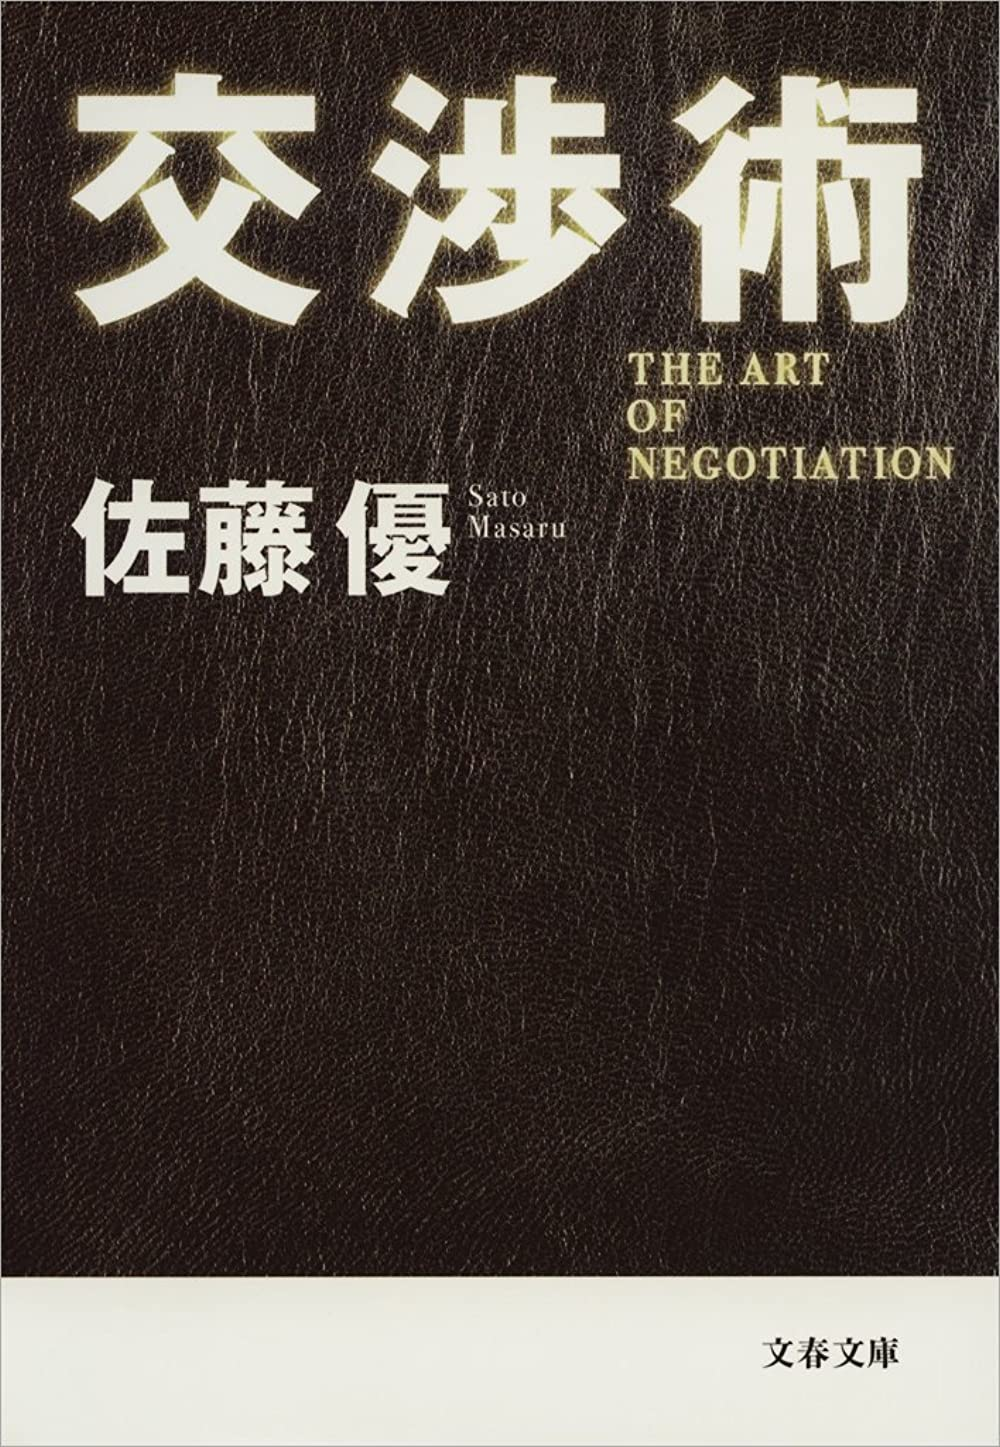 伝記地平線広告する交渉術 (文春文庫)